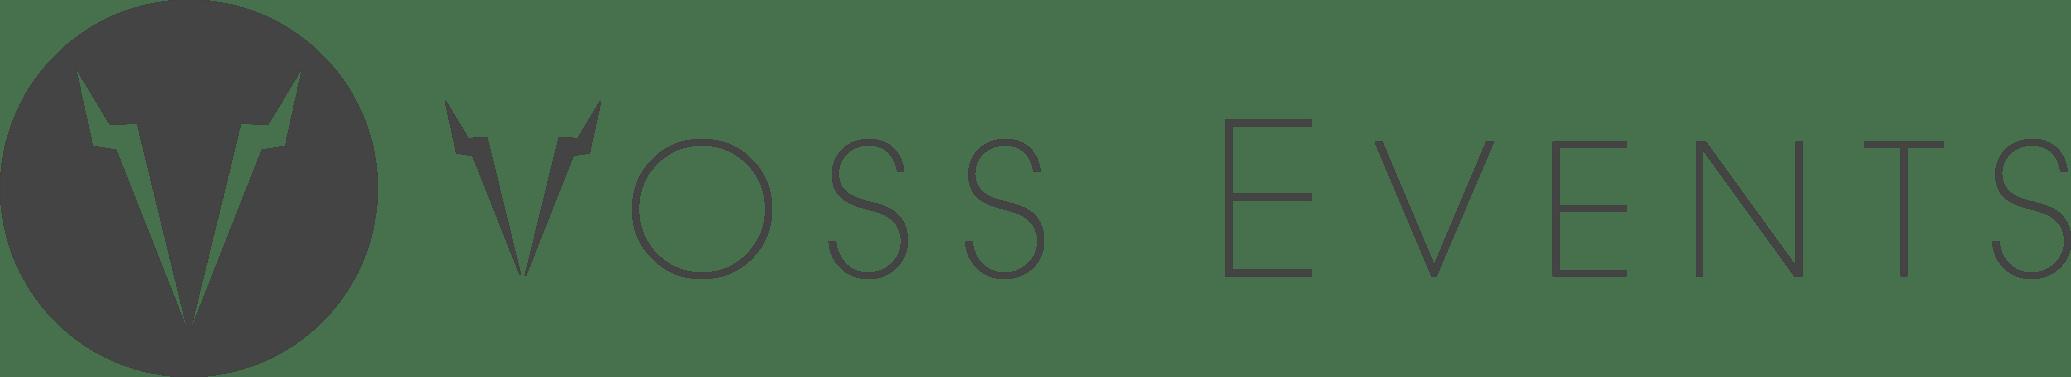 Voss Events - EUR